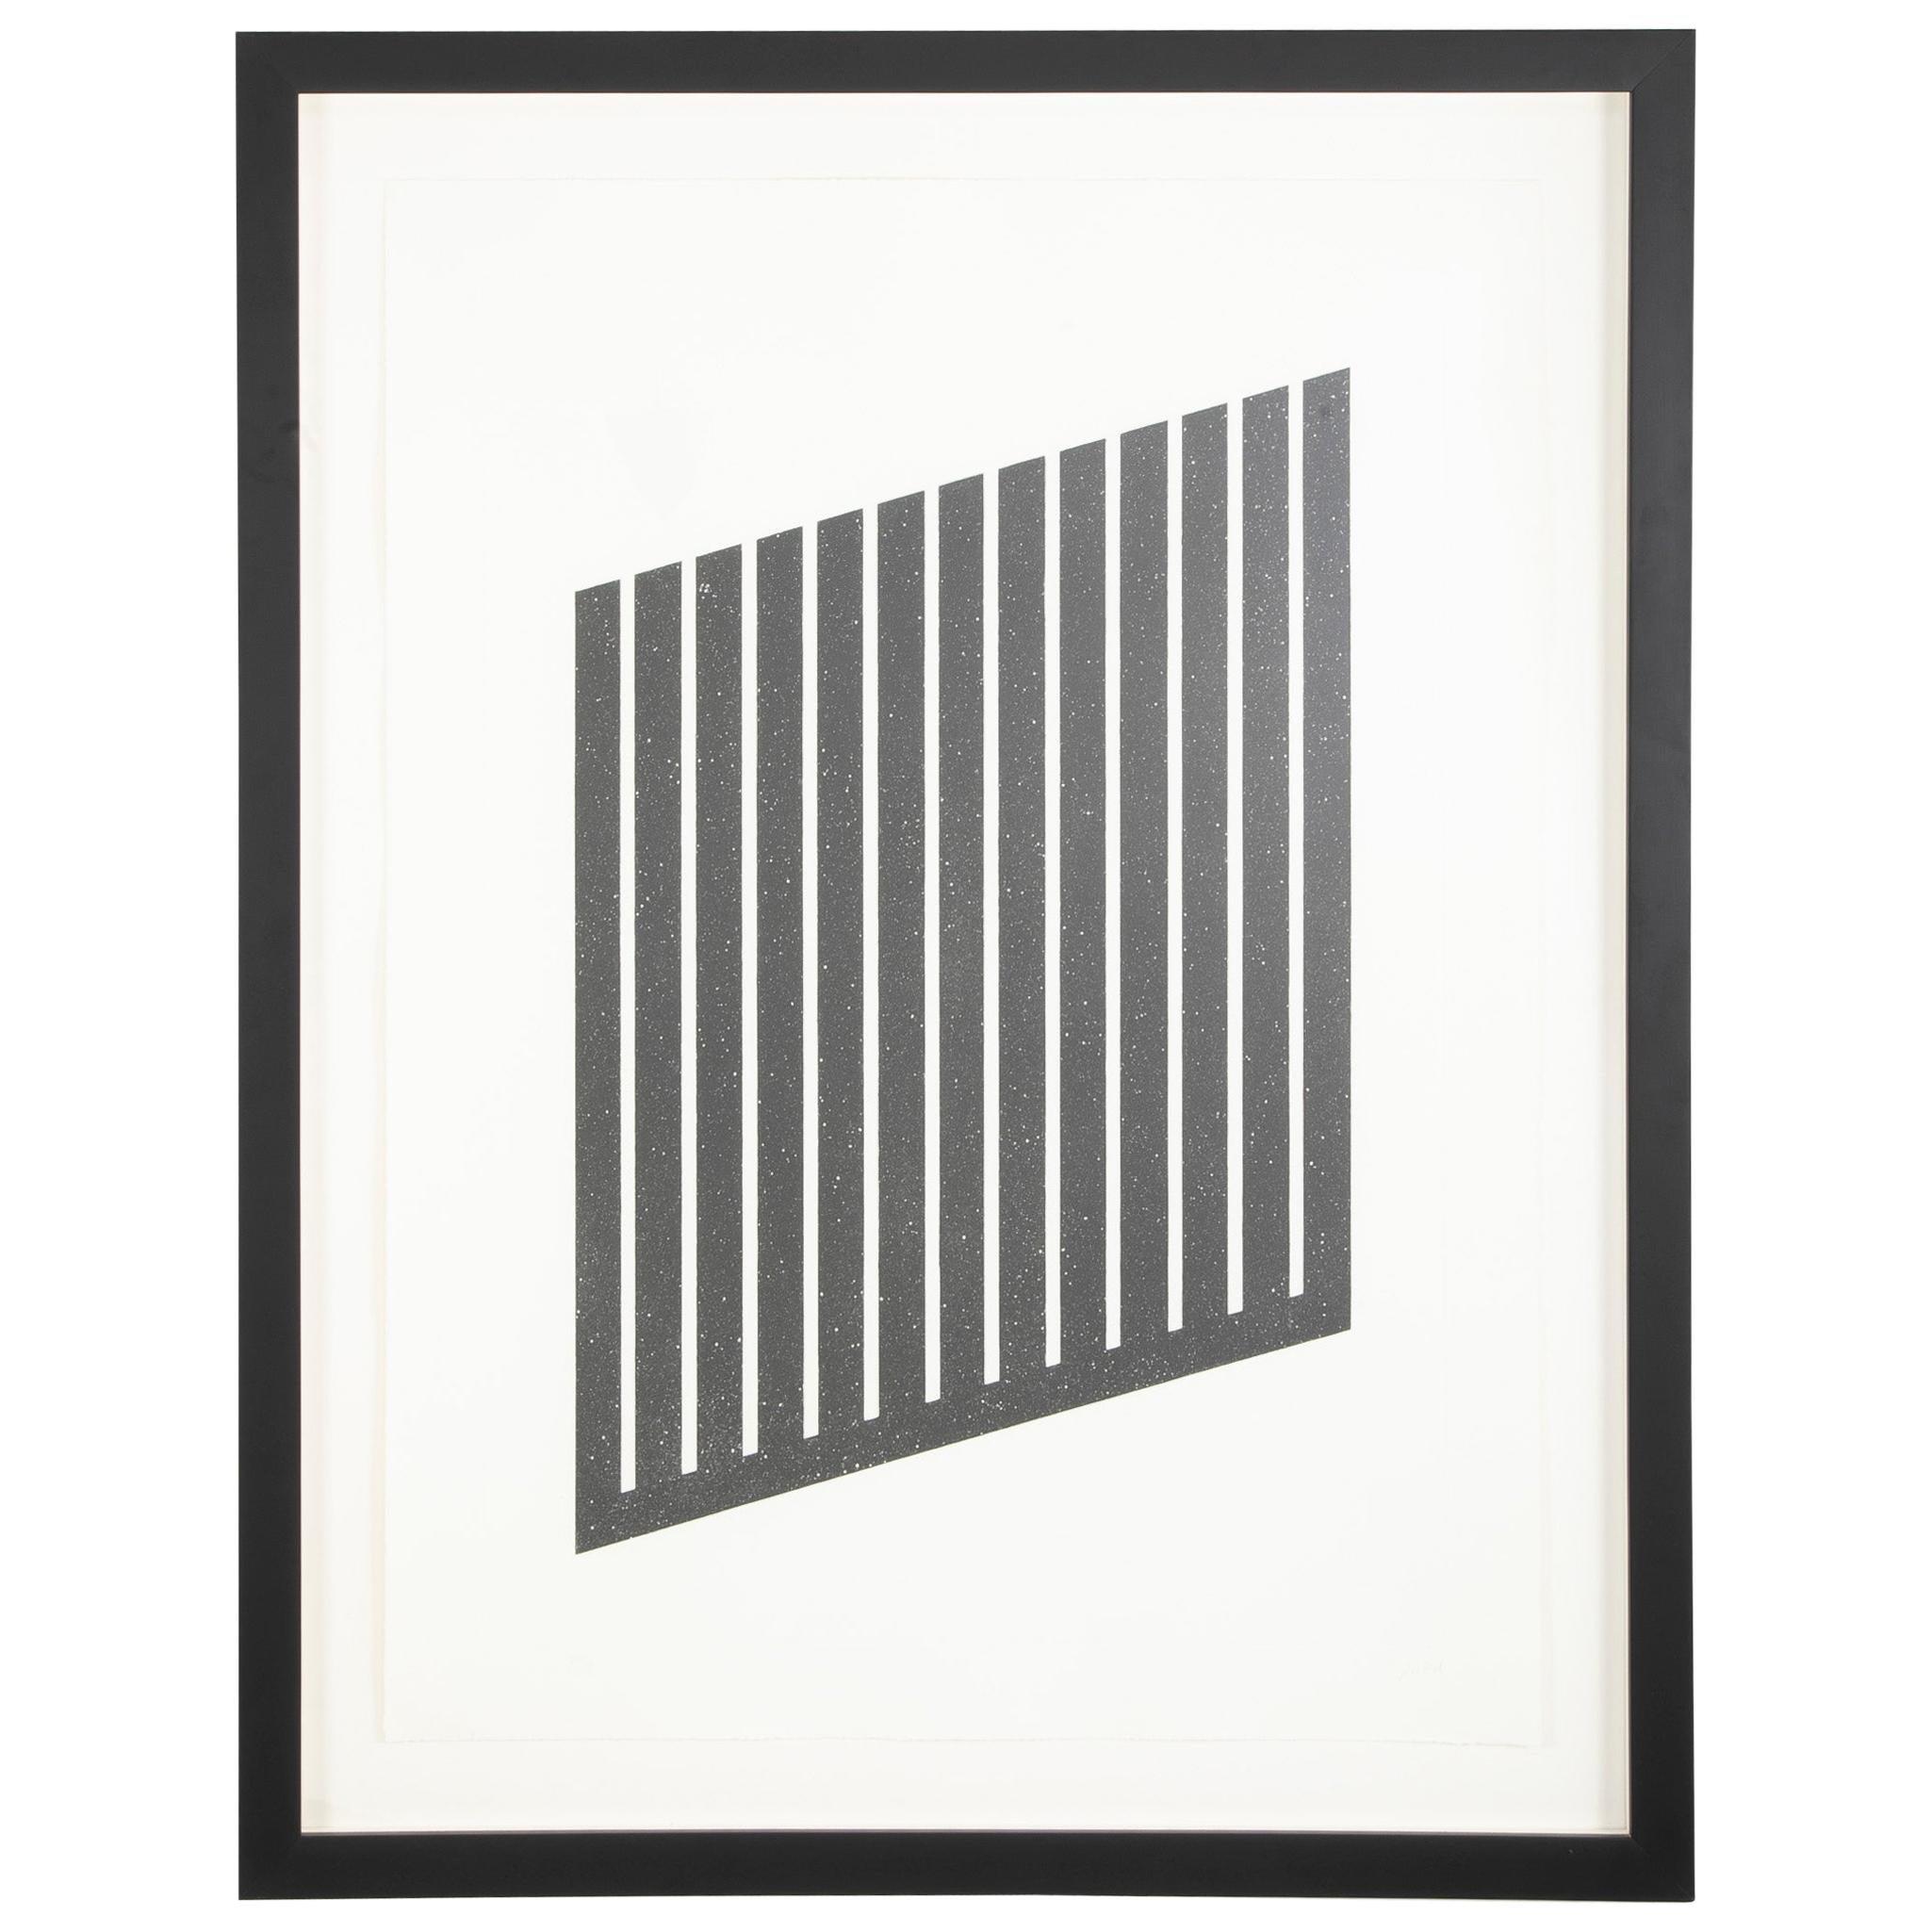 Donald Judd, Untitled 1978-1979